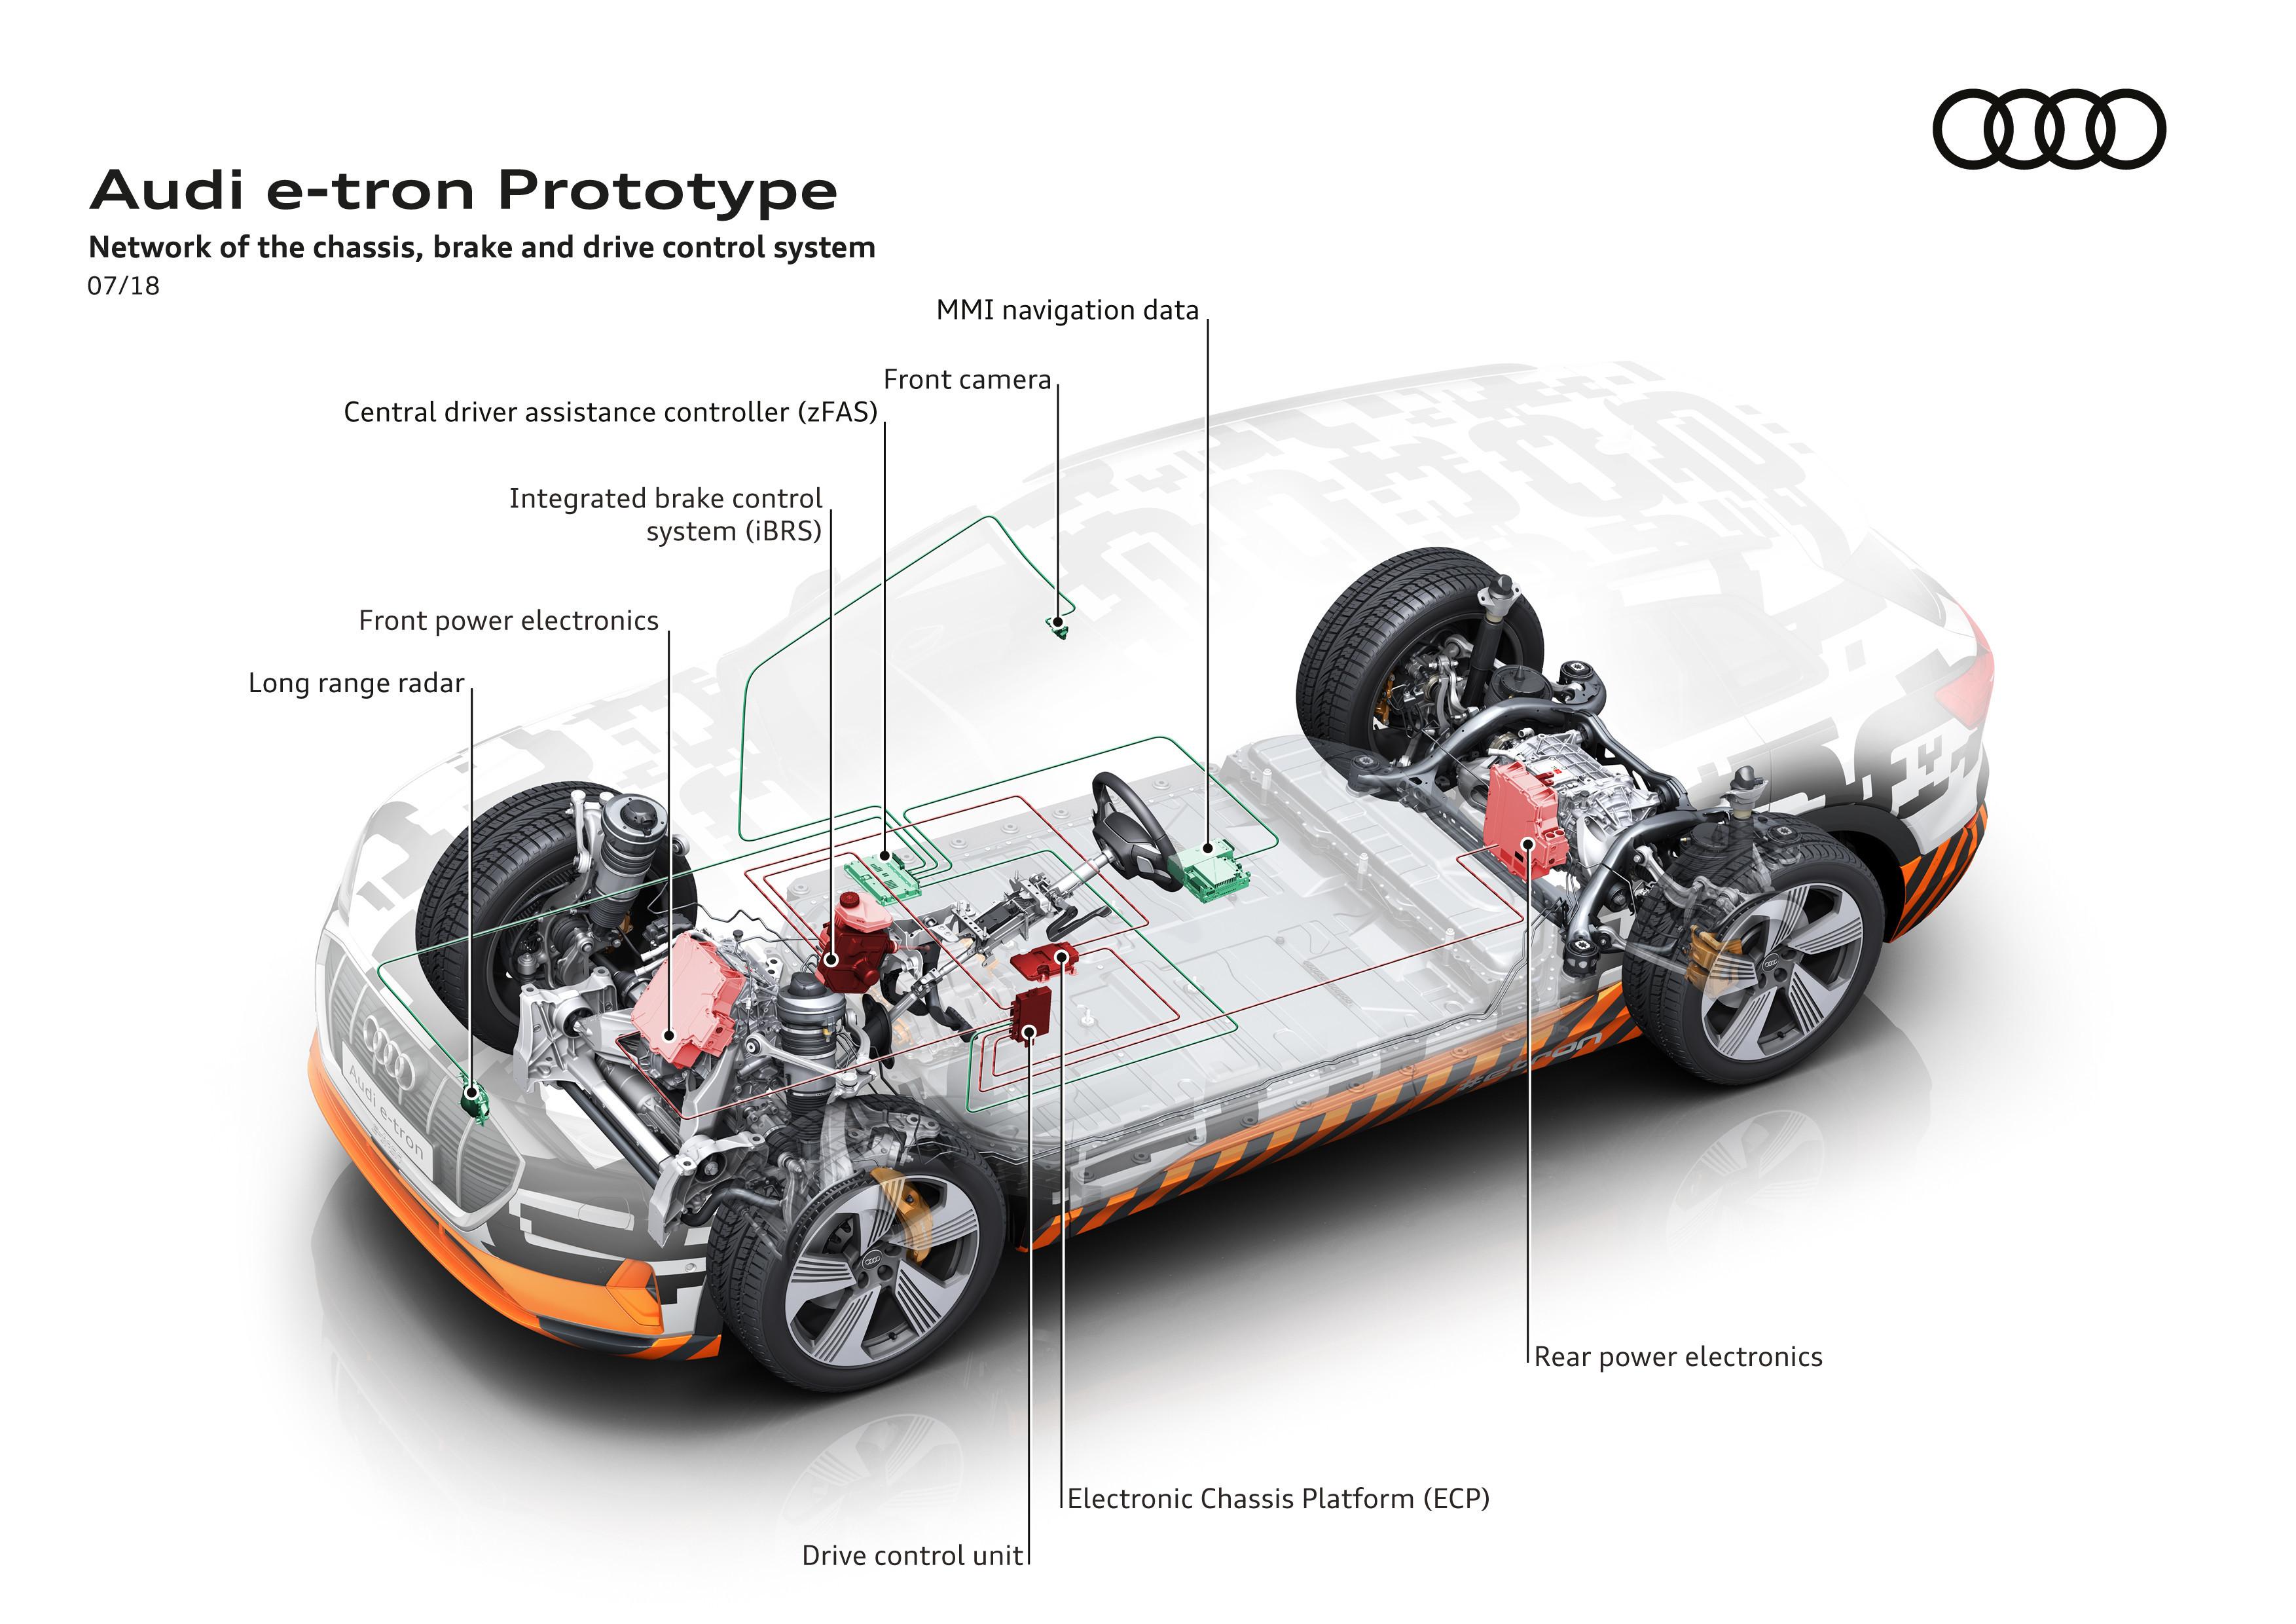 Tekniken under skalet i e-tron prototyp.